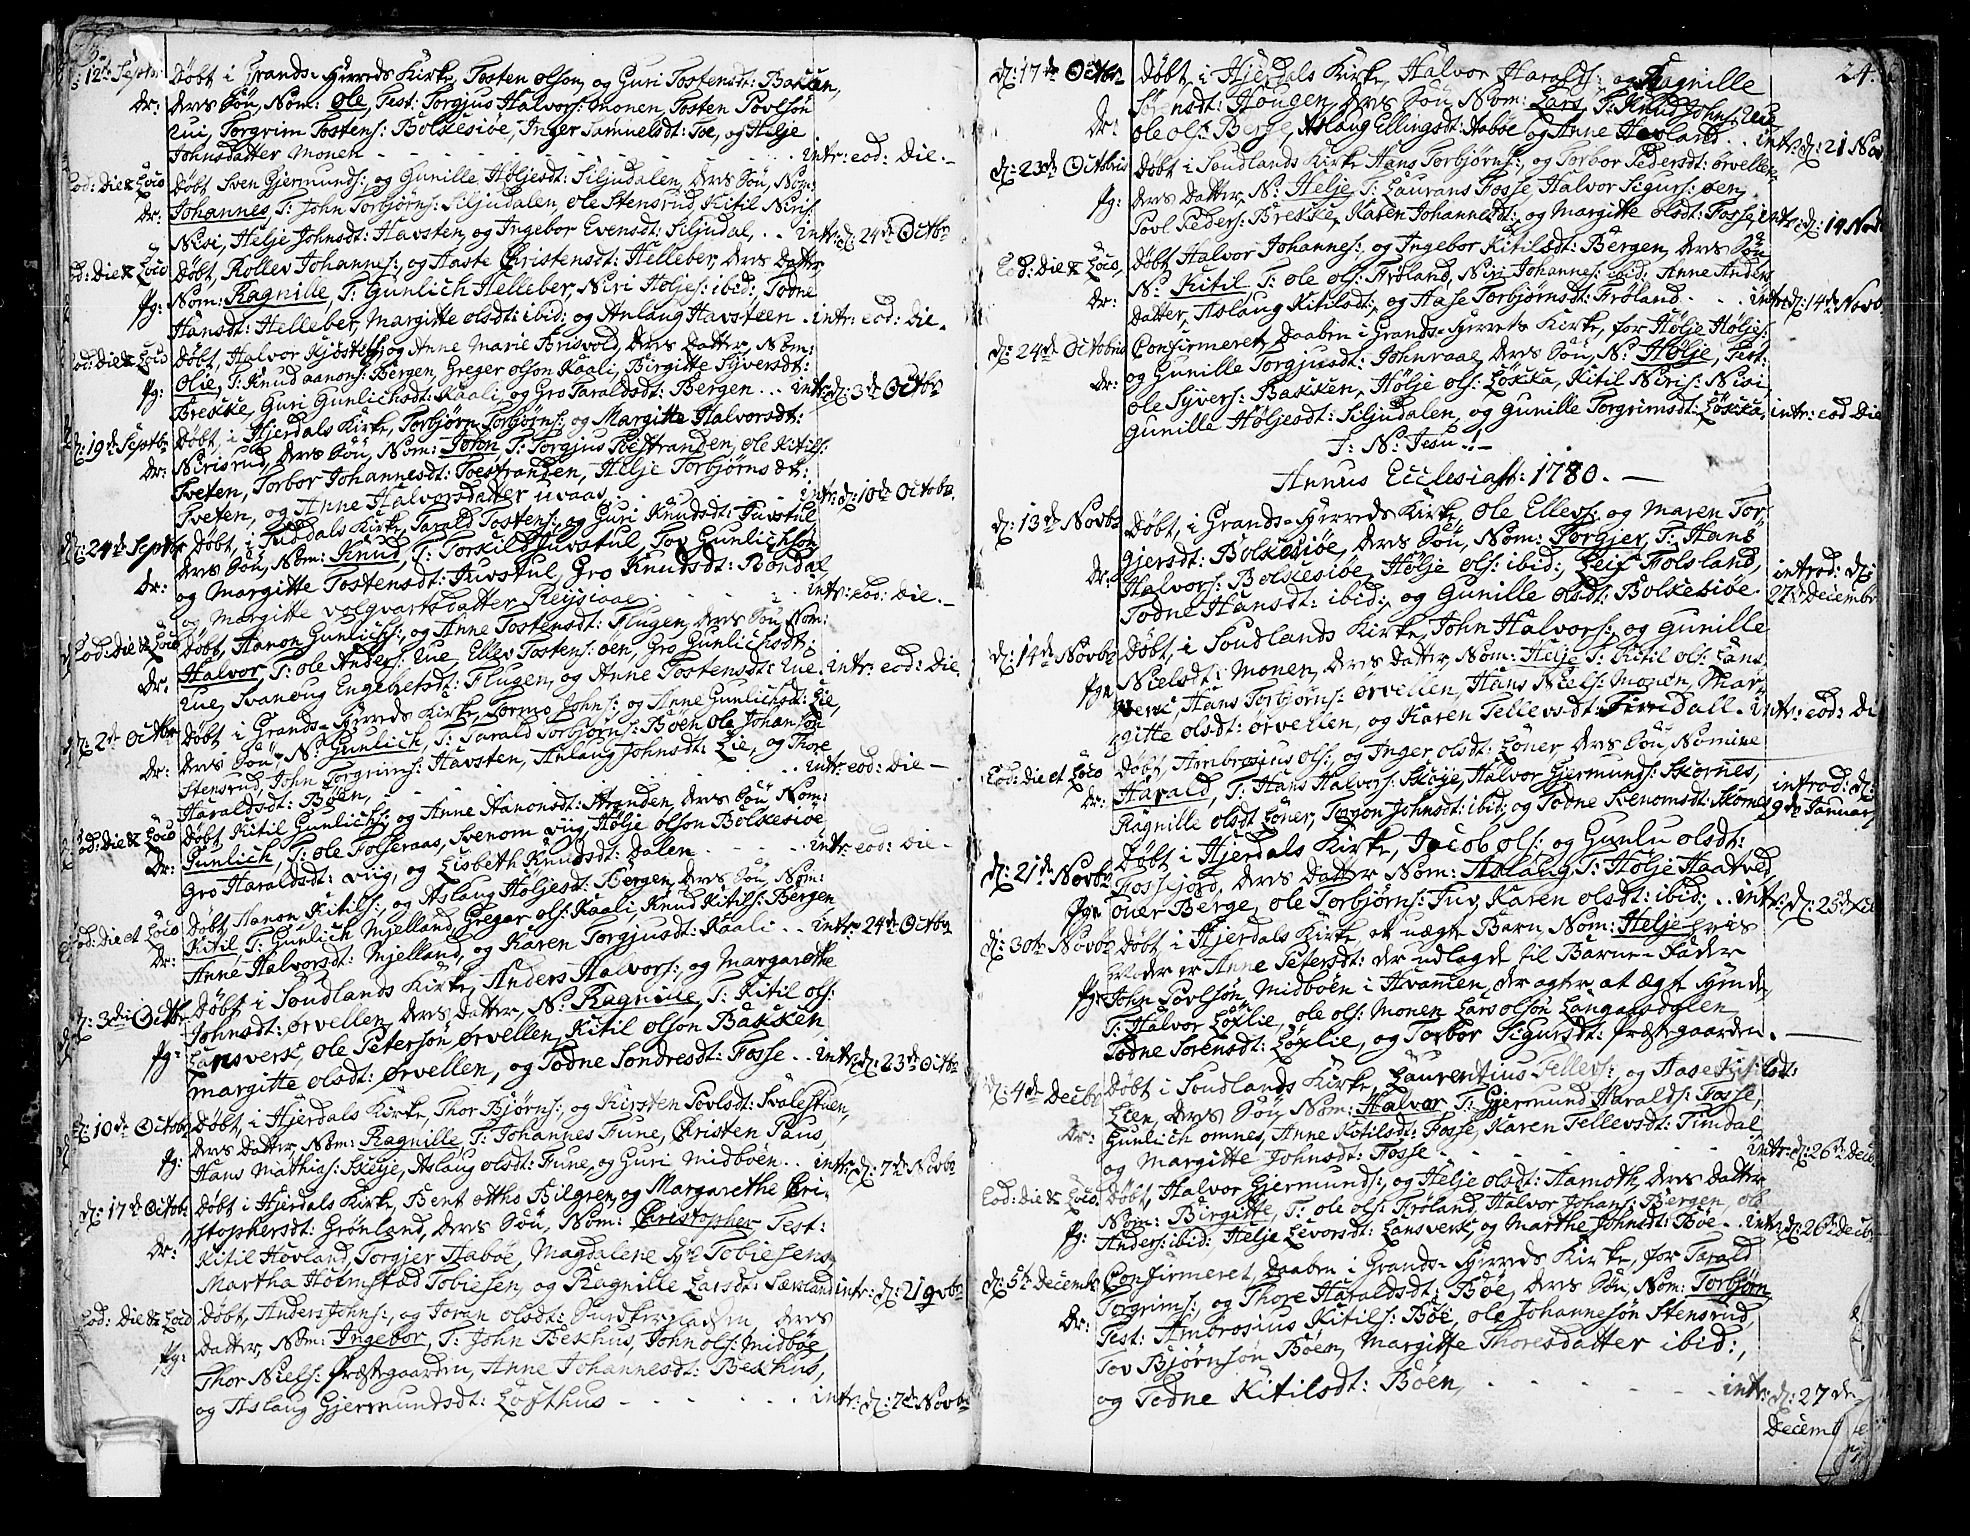 SAKO, Hjartdal kirkebøker, F/Fa/L0005: Ministerialbok nr. I 5, 1776-1801, s. 23-24